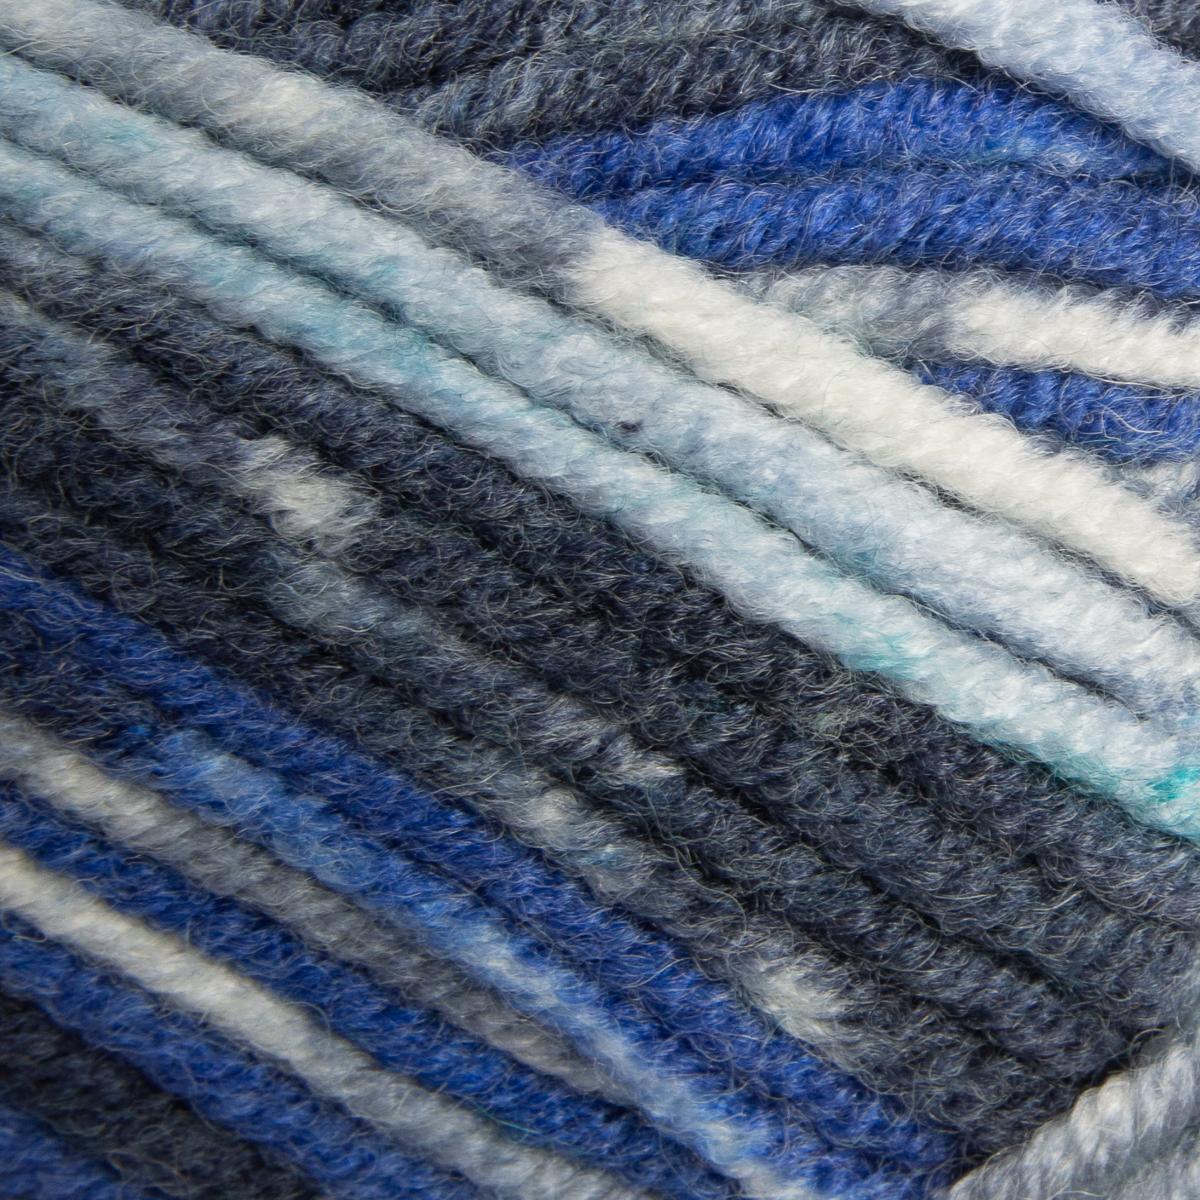 3pk-Lion-Brand-Woolspun-Acrylic-amp-Wool-Yarn-Bulky-5-Knit-Crocheting-Skeins-Soft thumbnail 47